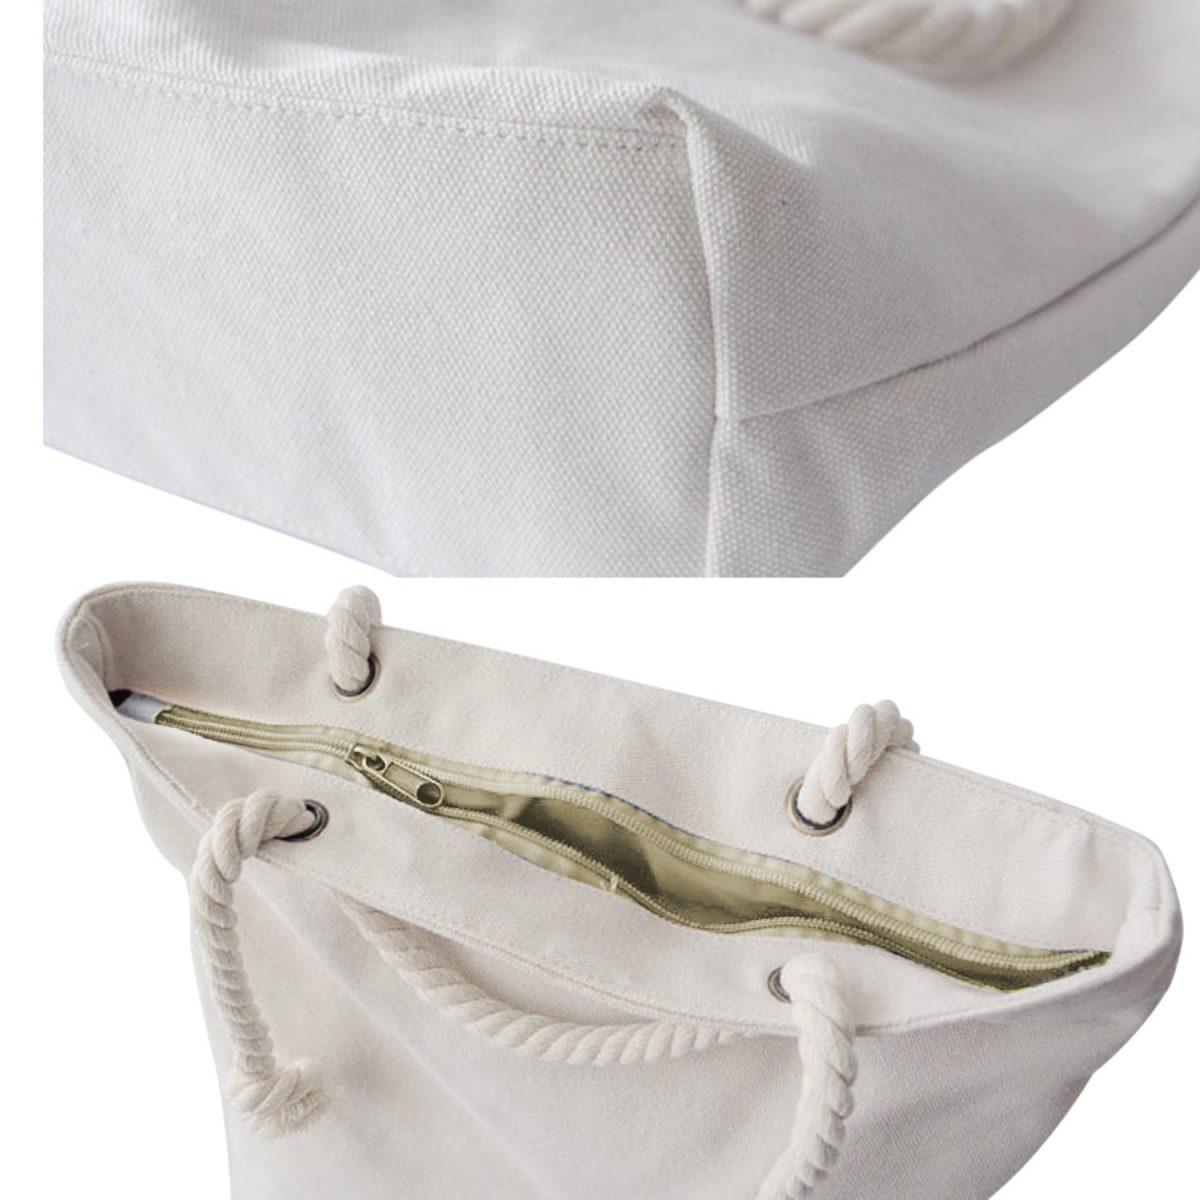 Kare Temalı Gül Çizimli Fermuarlı Kumaş Çanta Realhomes